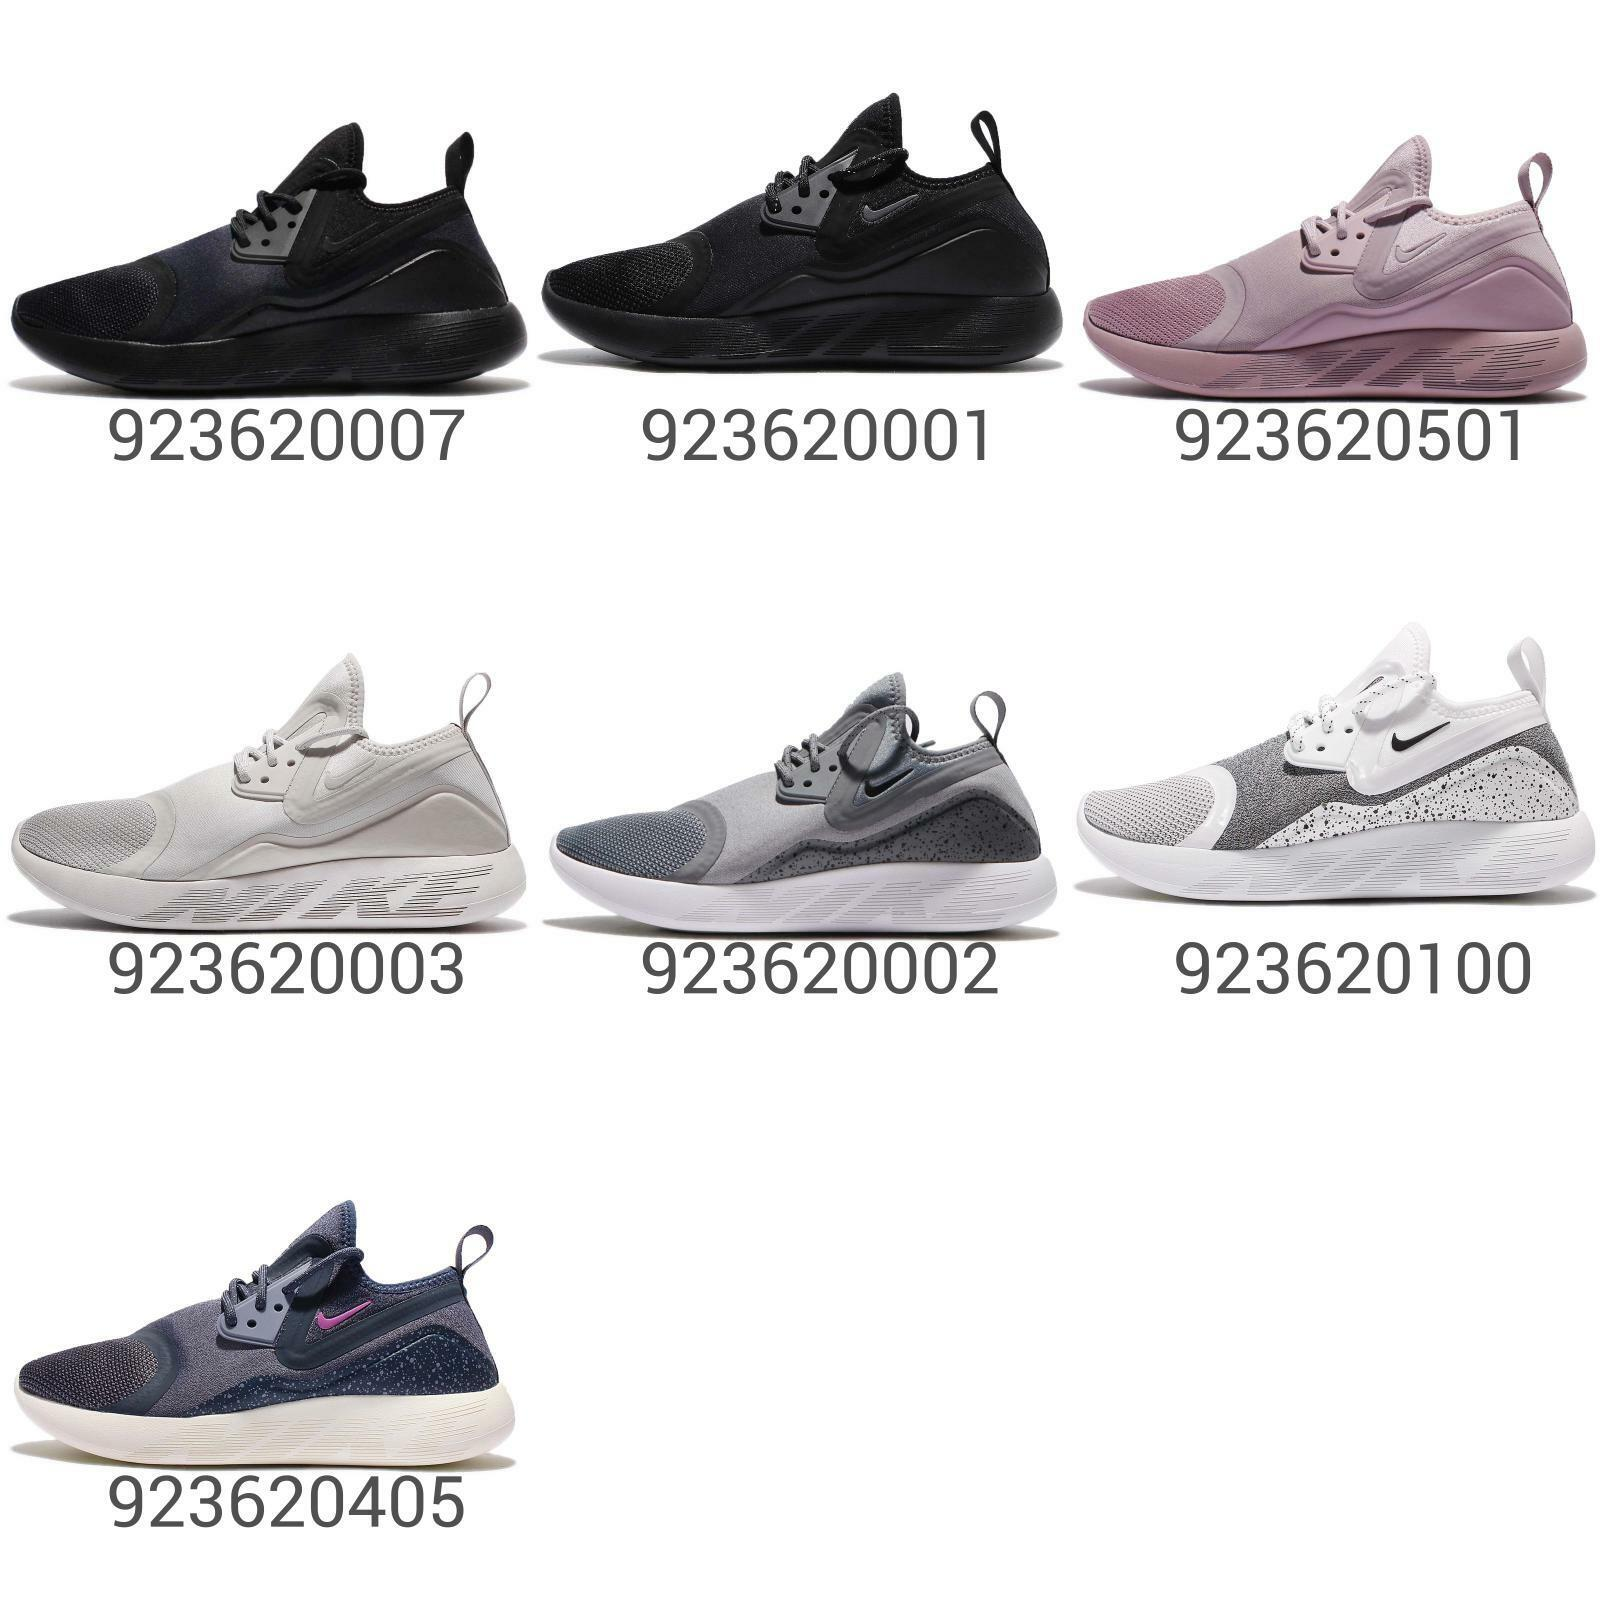 Nike Wmns Lunarcharge Essential donna Running scarpe Lunarlon scarpe da ginnastica Pick 1